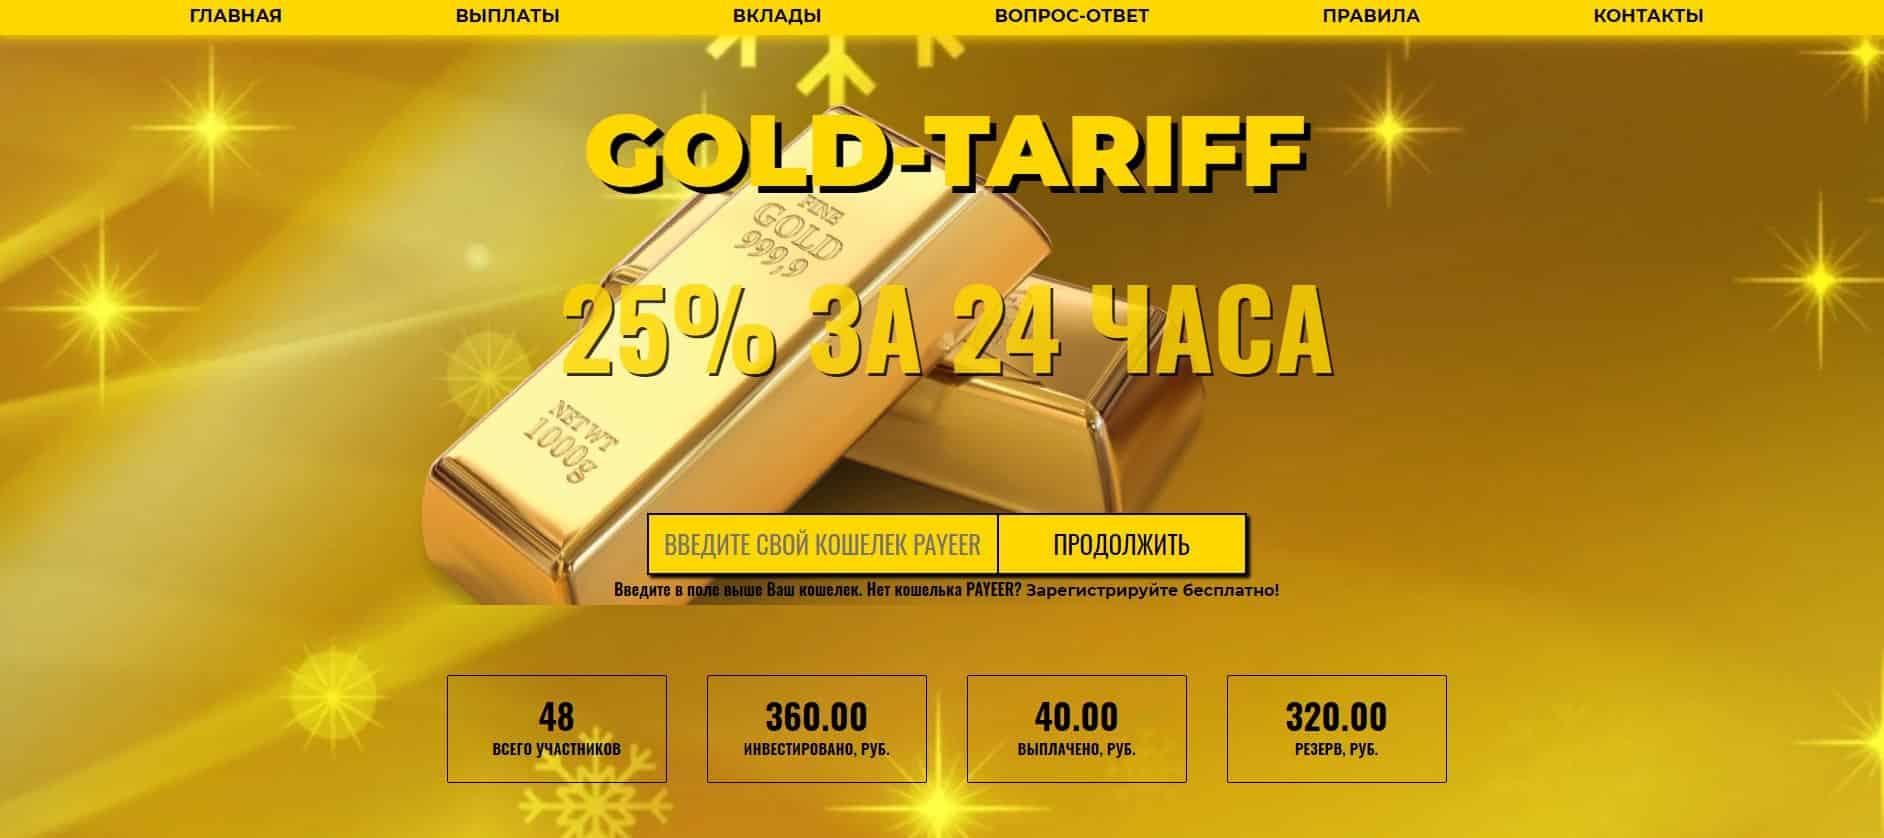 GOLD-TARIFF